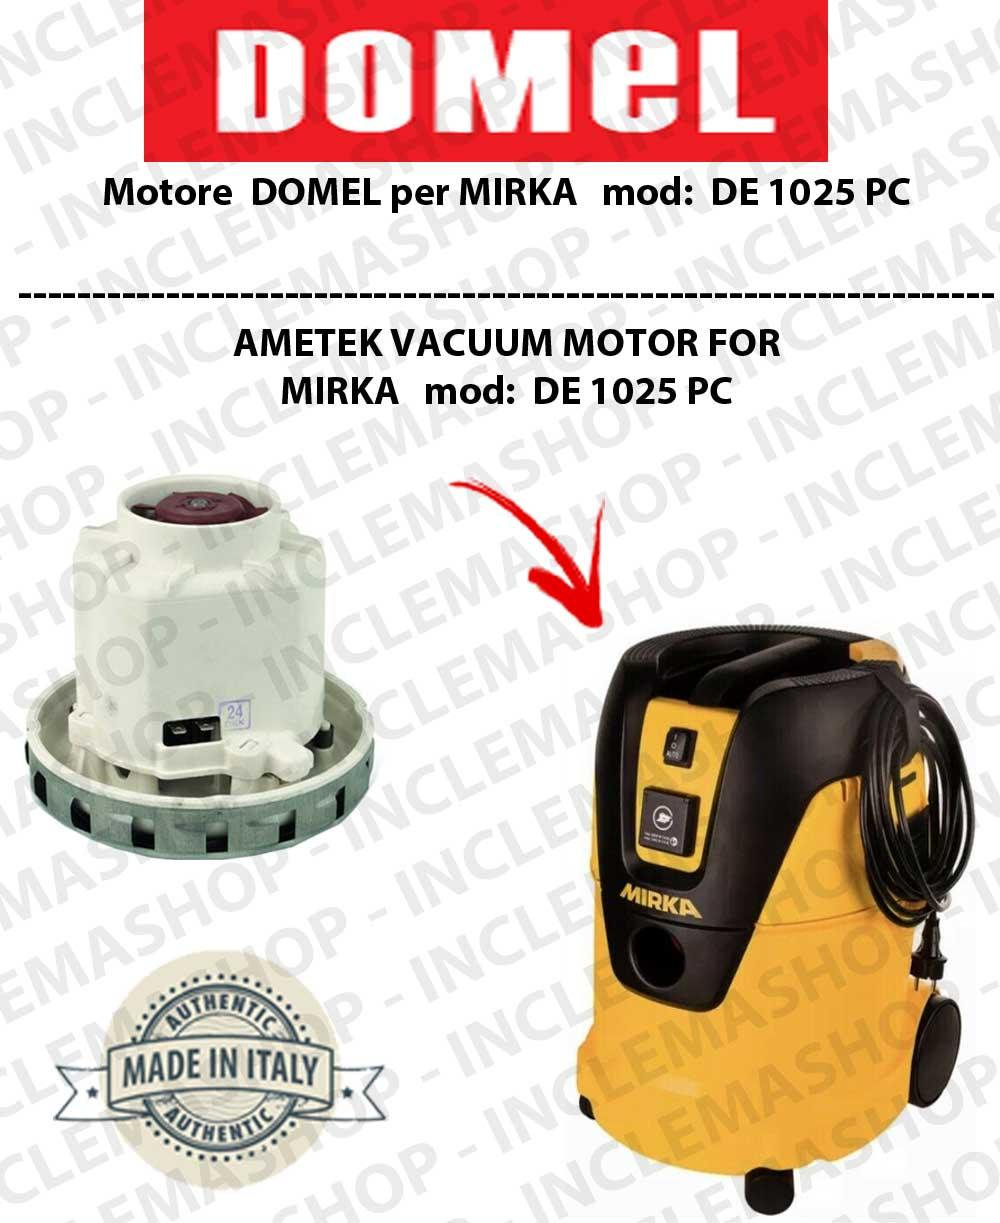 Motor vacuum cleaner for mirka 915l mirca 915m original domel 1200 watt